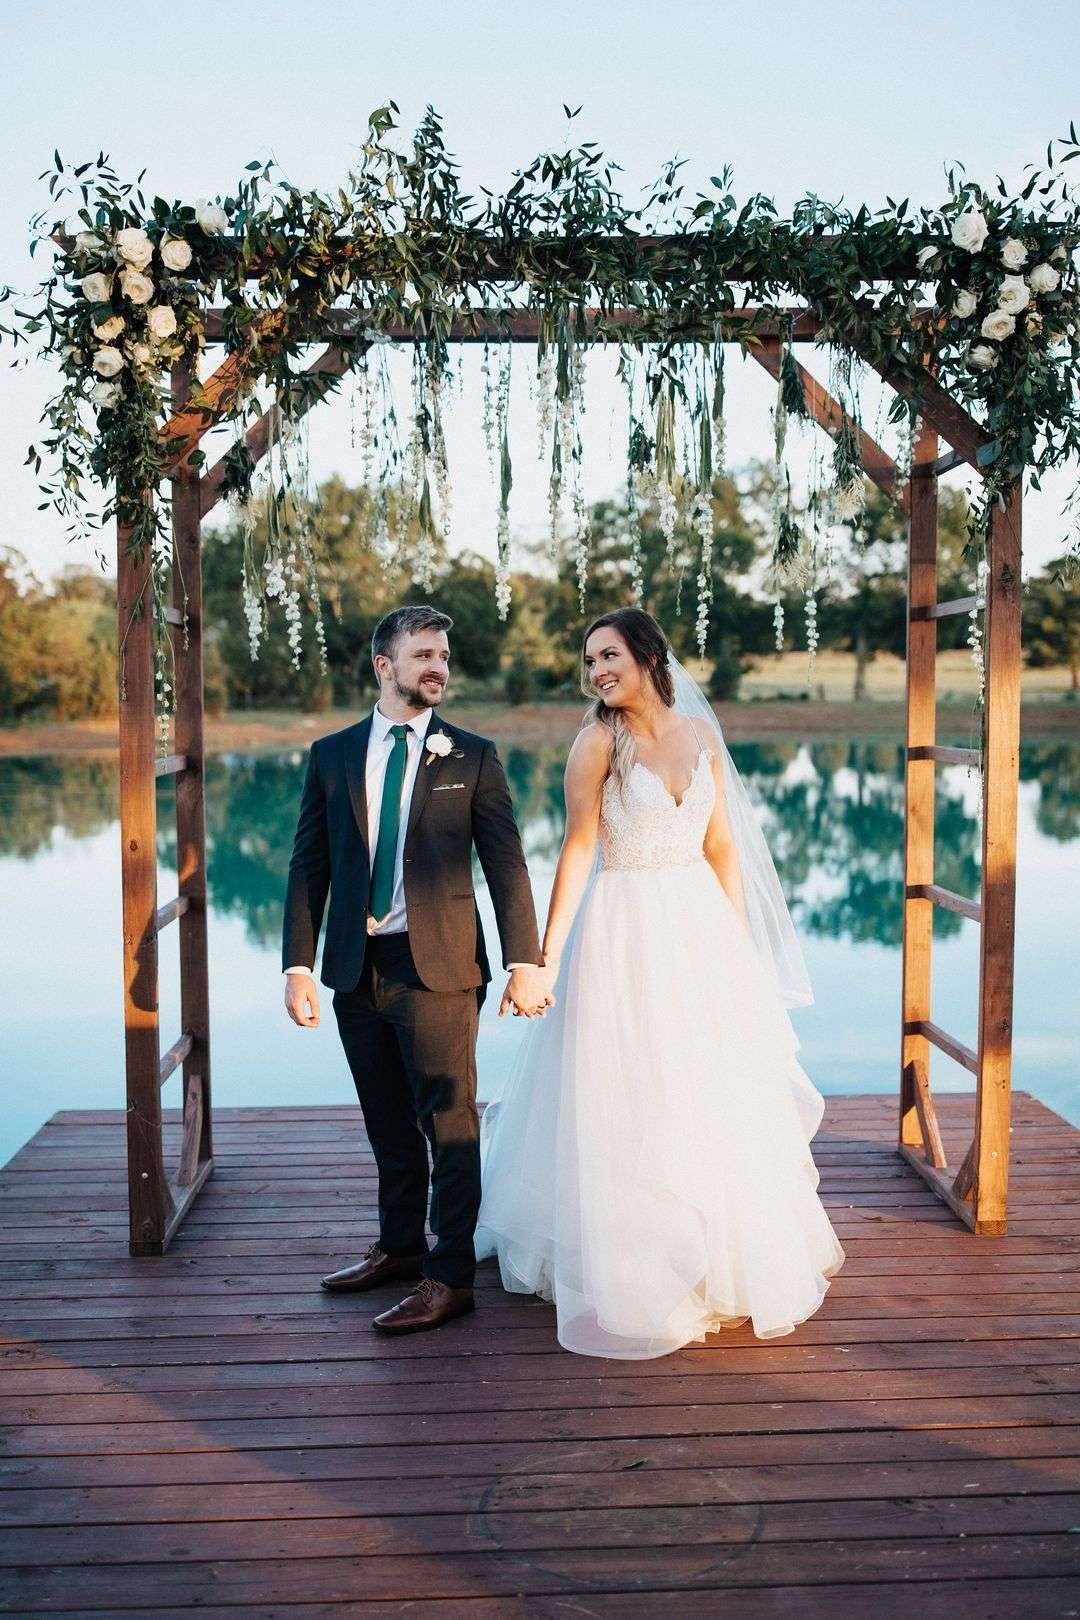 outdoor wedding ceremony arbor with flowers